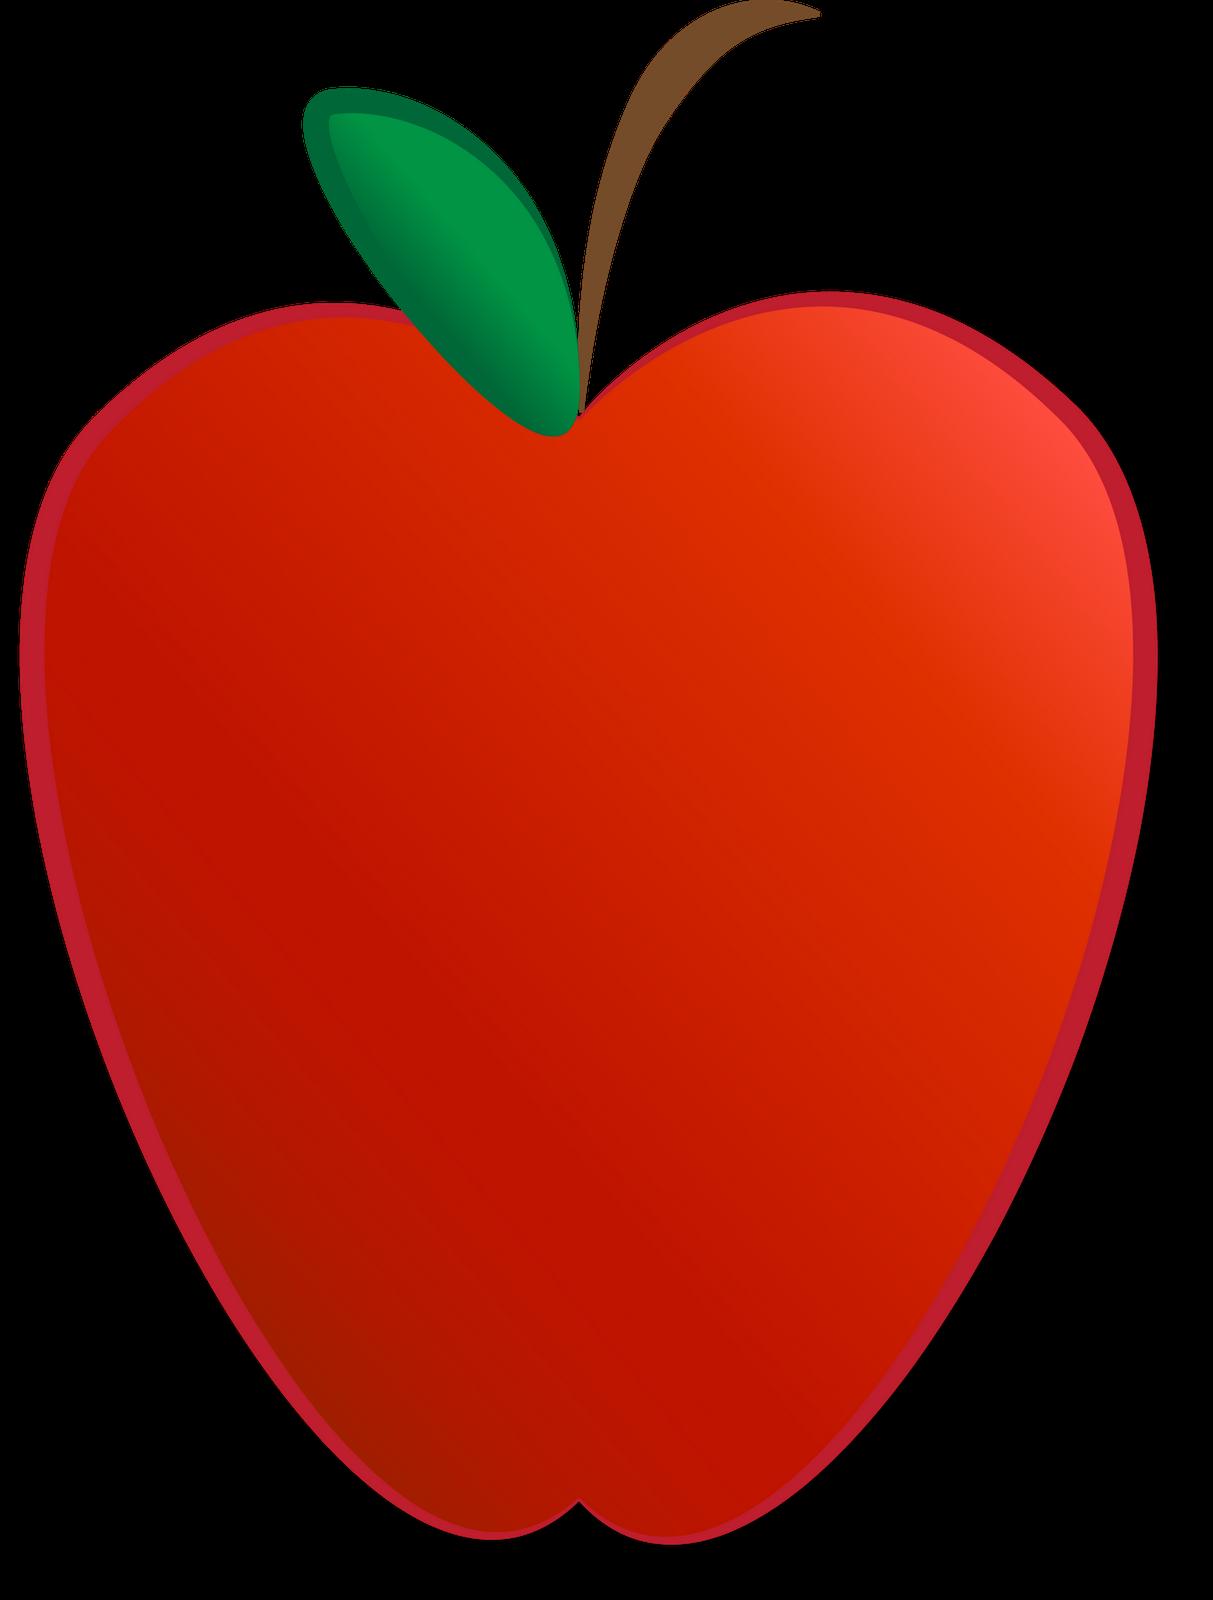 Clipart womry apple jpg royalty free library Carrie's Speech Corner: Back to School Week: Open Ended Wormy Apples ... jpg royalty free library